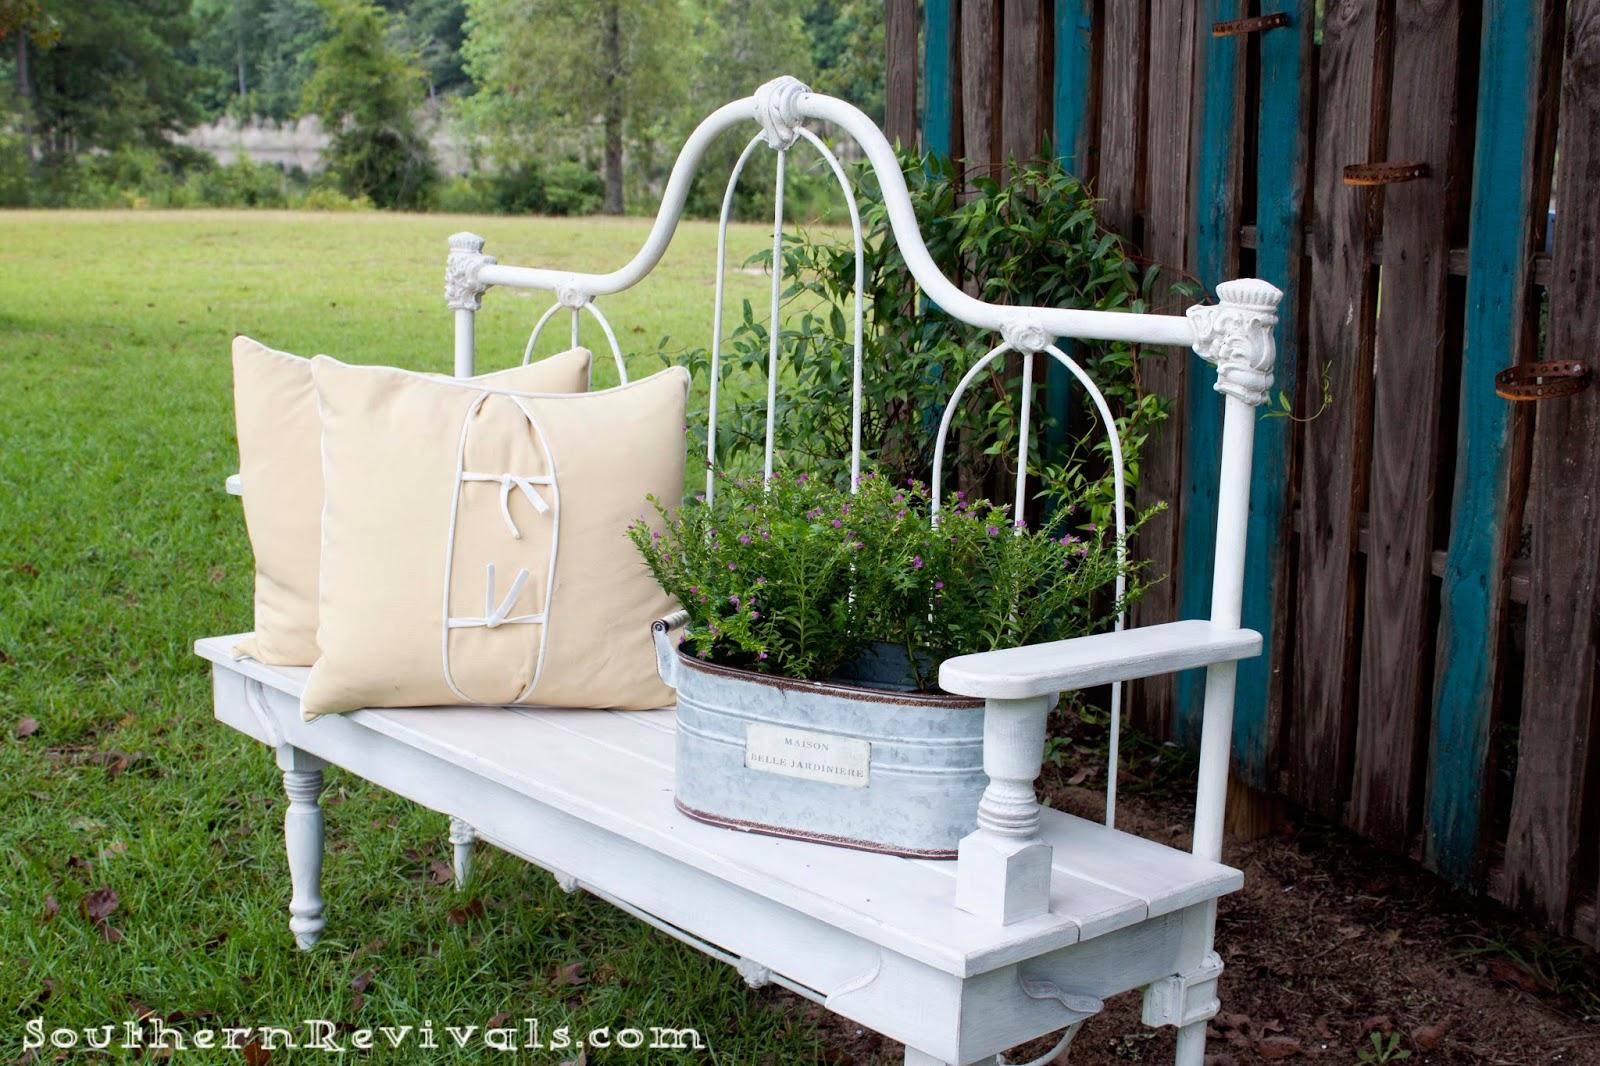 headboard garden bench DIY Repurposed Metal Headboard Bench - Southern Revivals